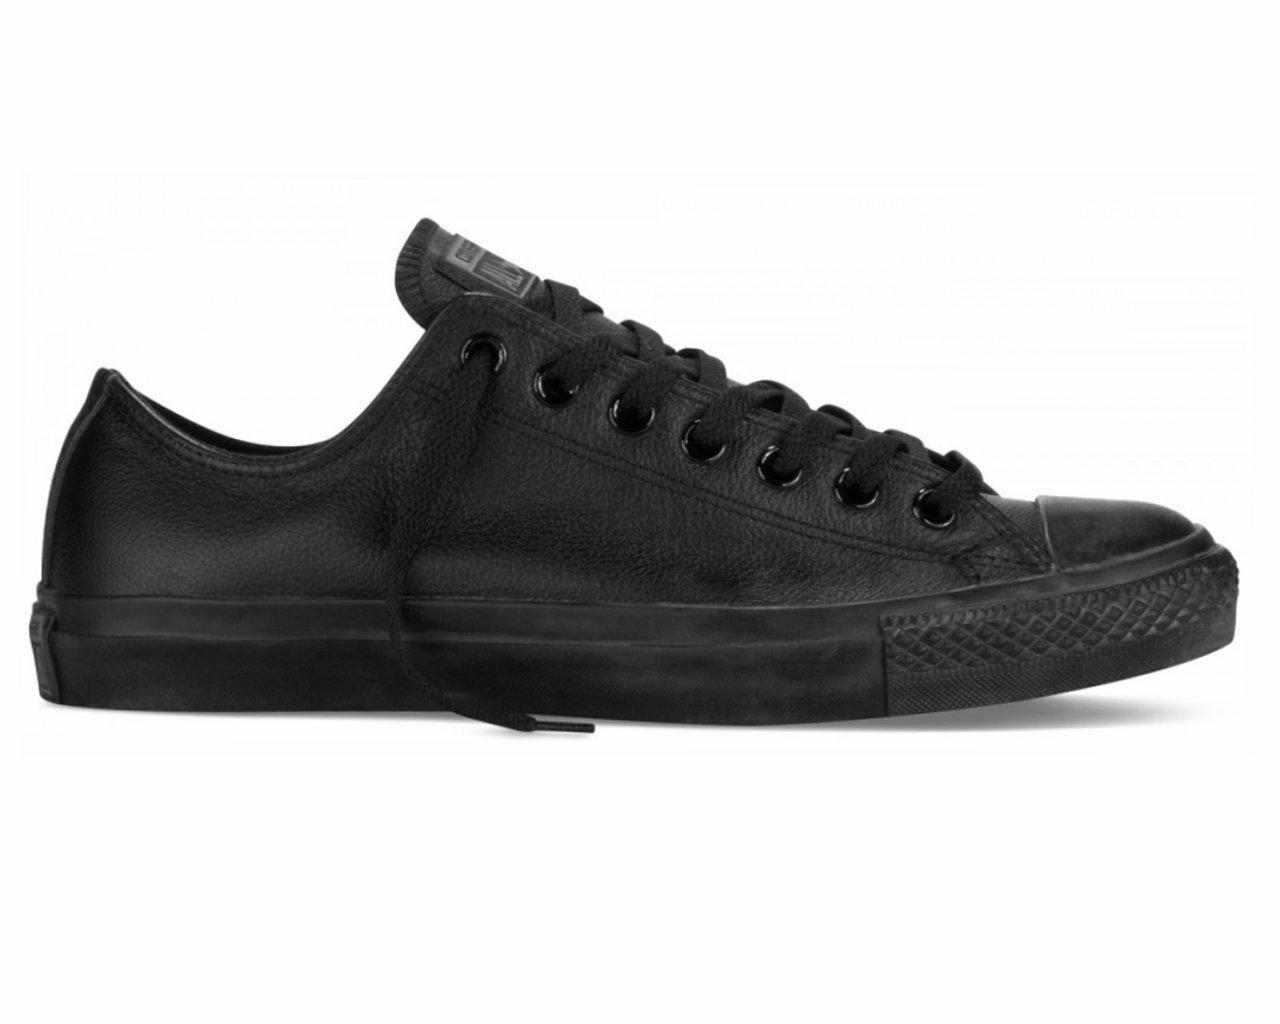 21a075da8c4 Converse - Chuck Taylor All Star Ox C Leather Trainers Black Mono for Men -  Lyst. View fullscreen